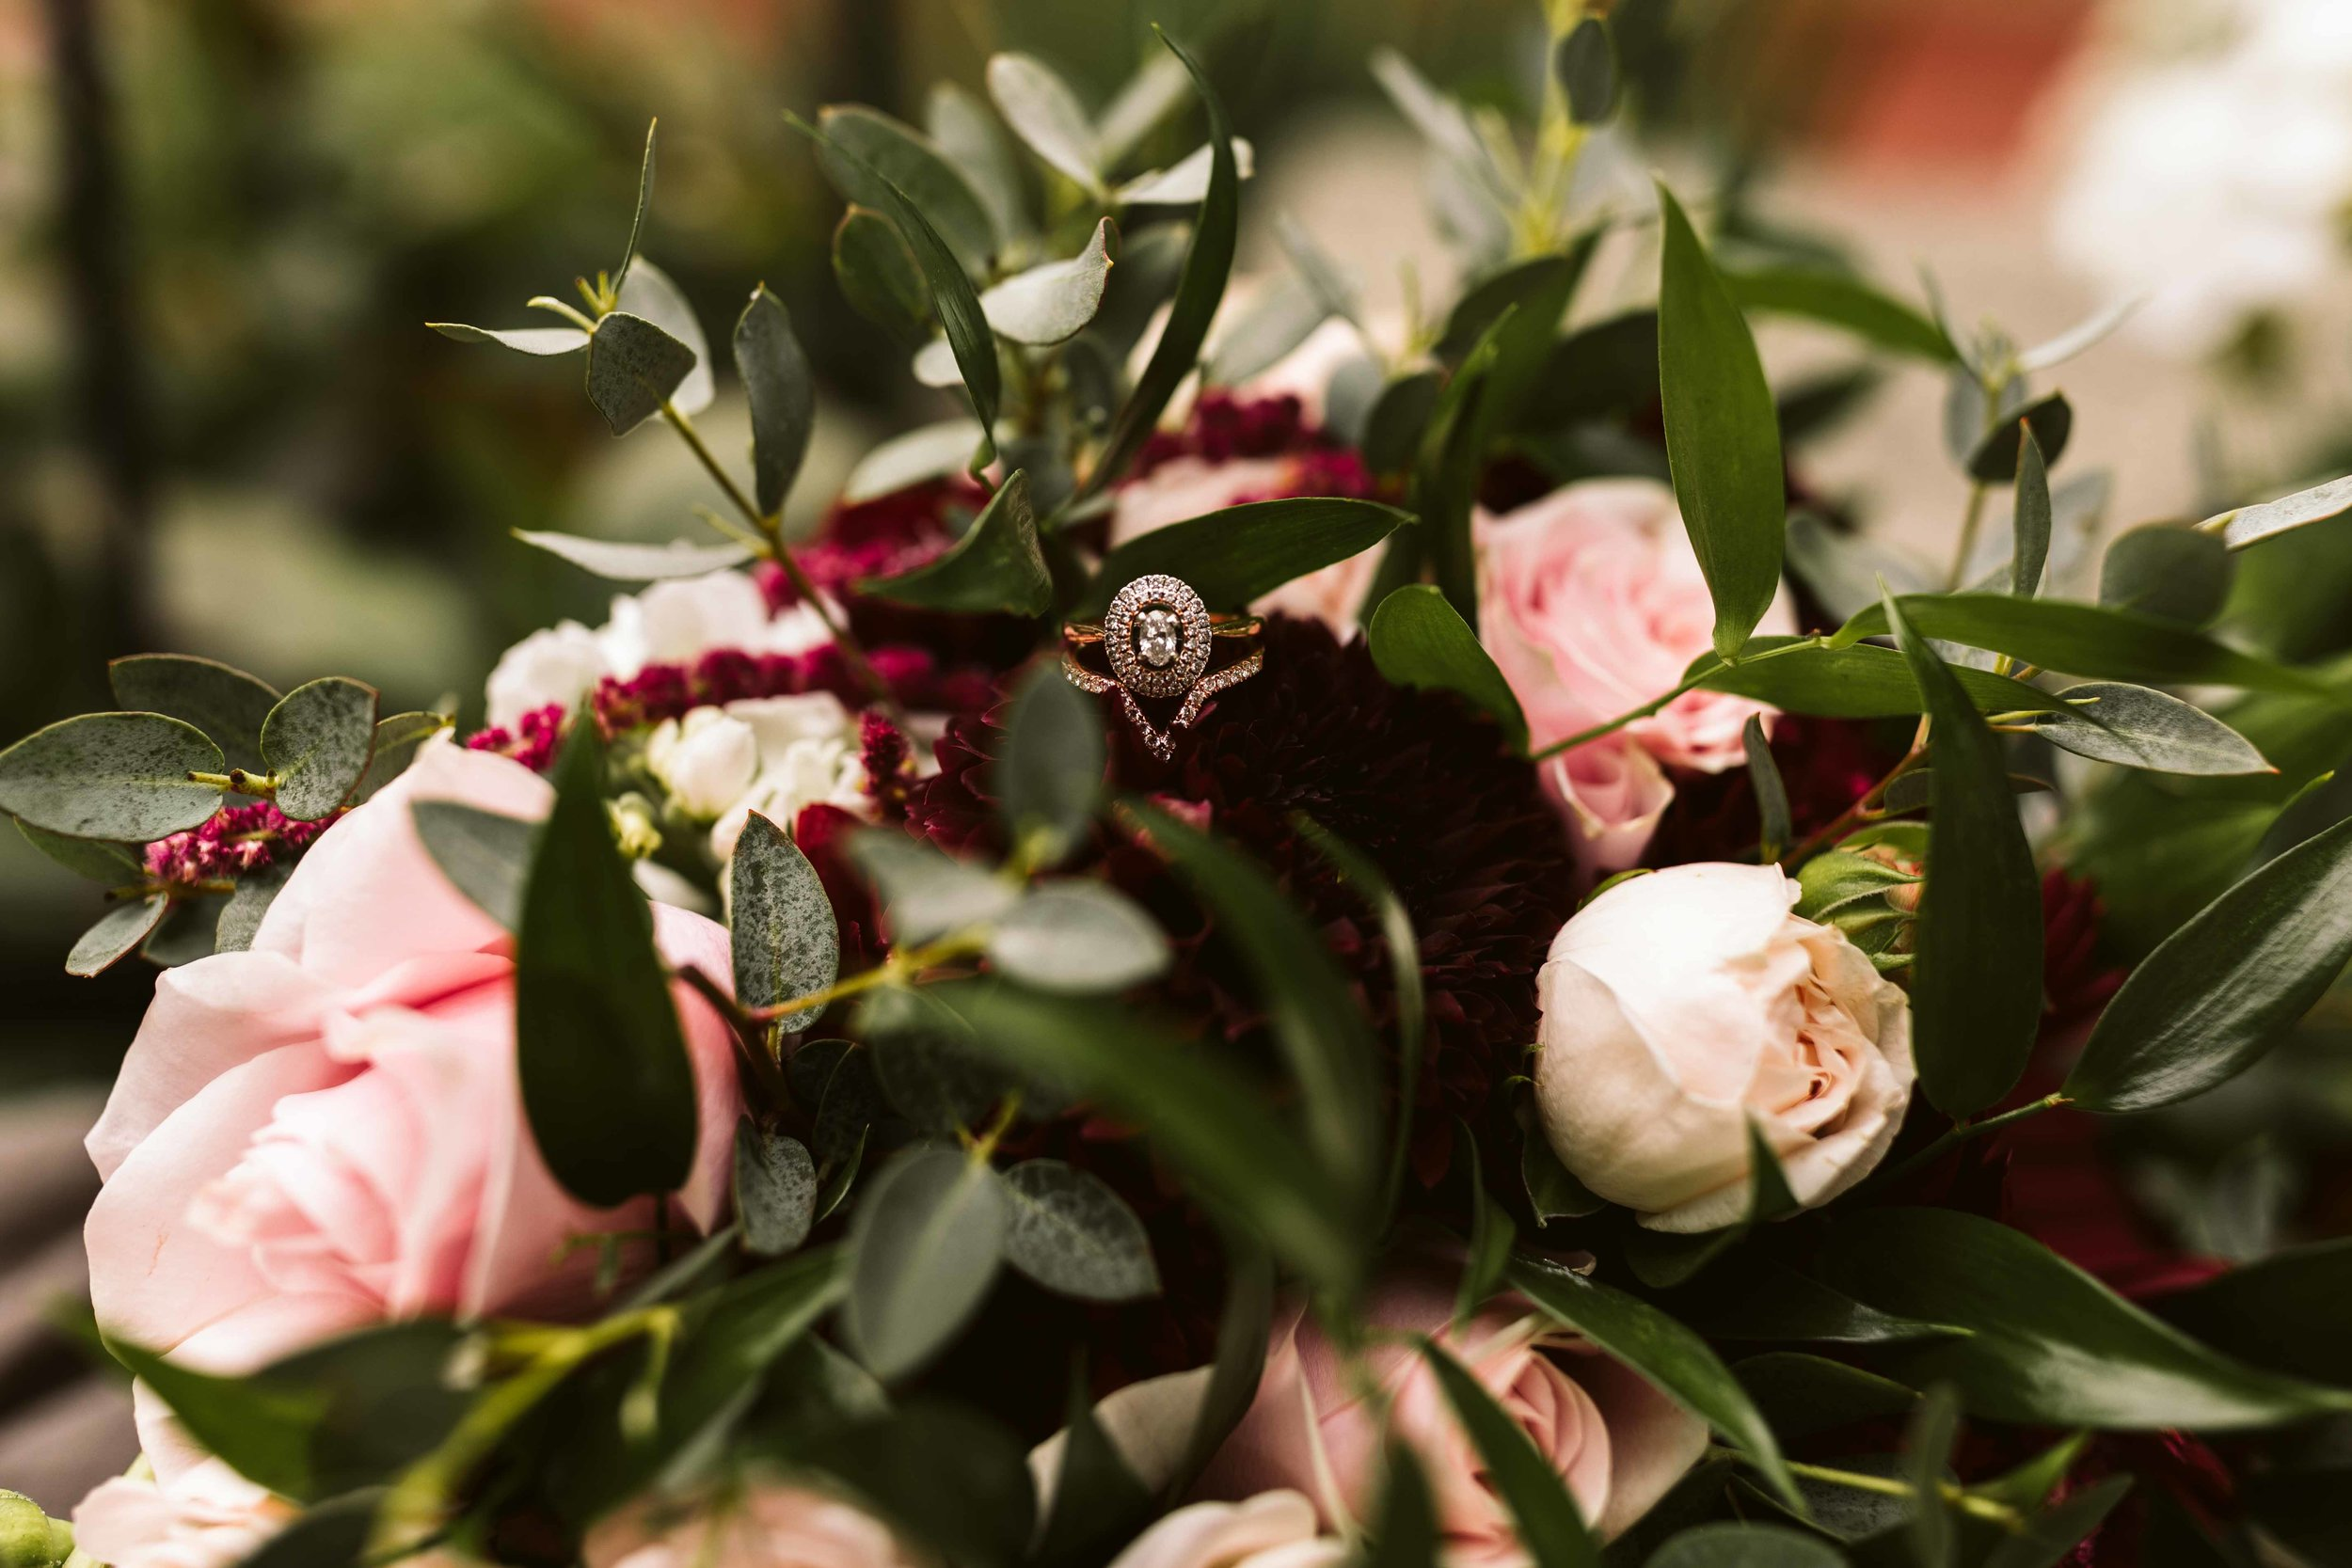 lairmont-manor-wedding-3.jpg